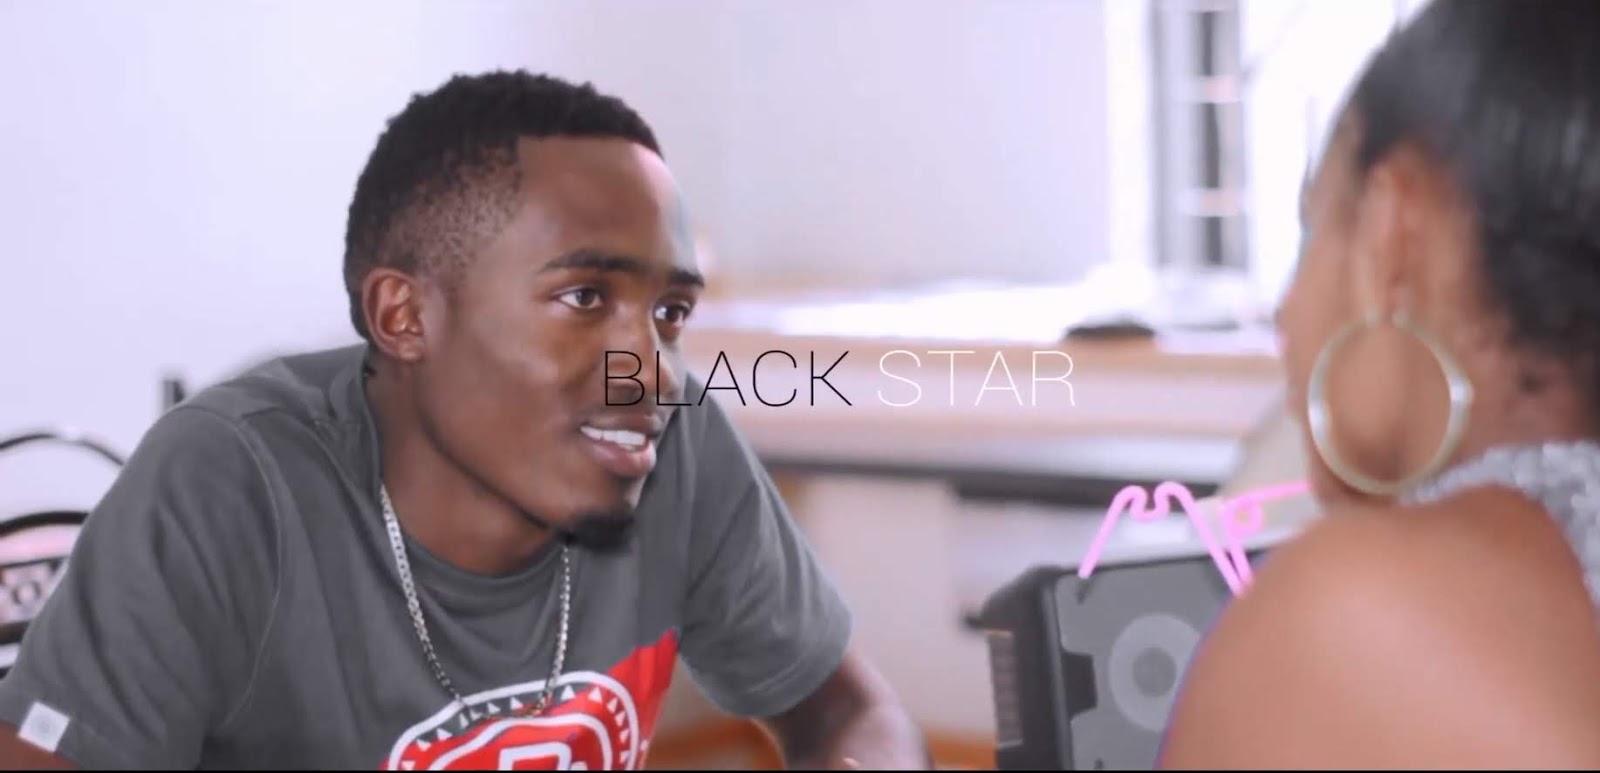 Black Star - Hukunifaa